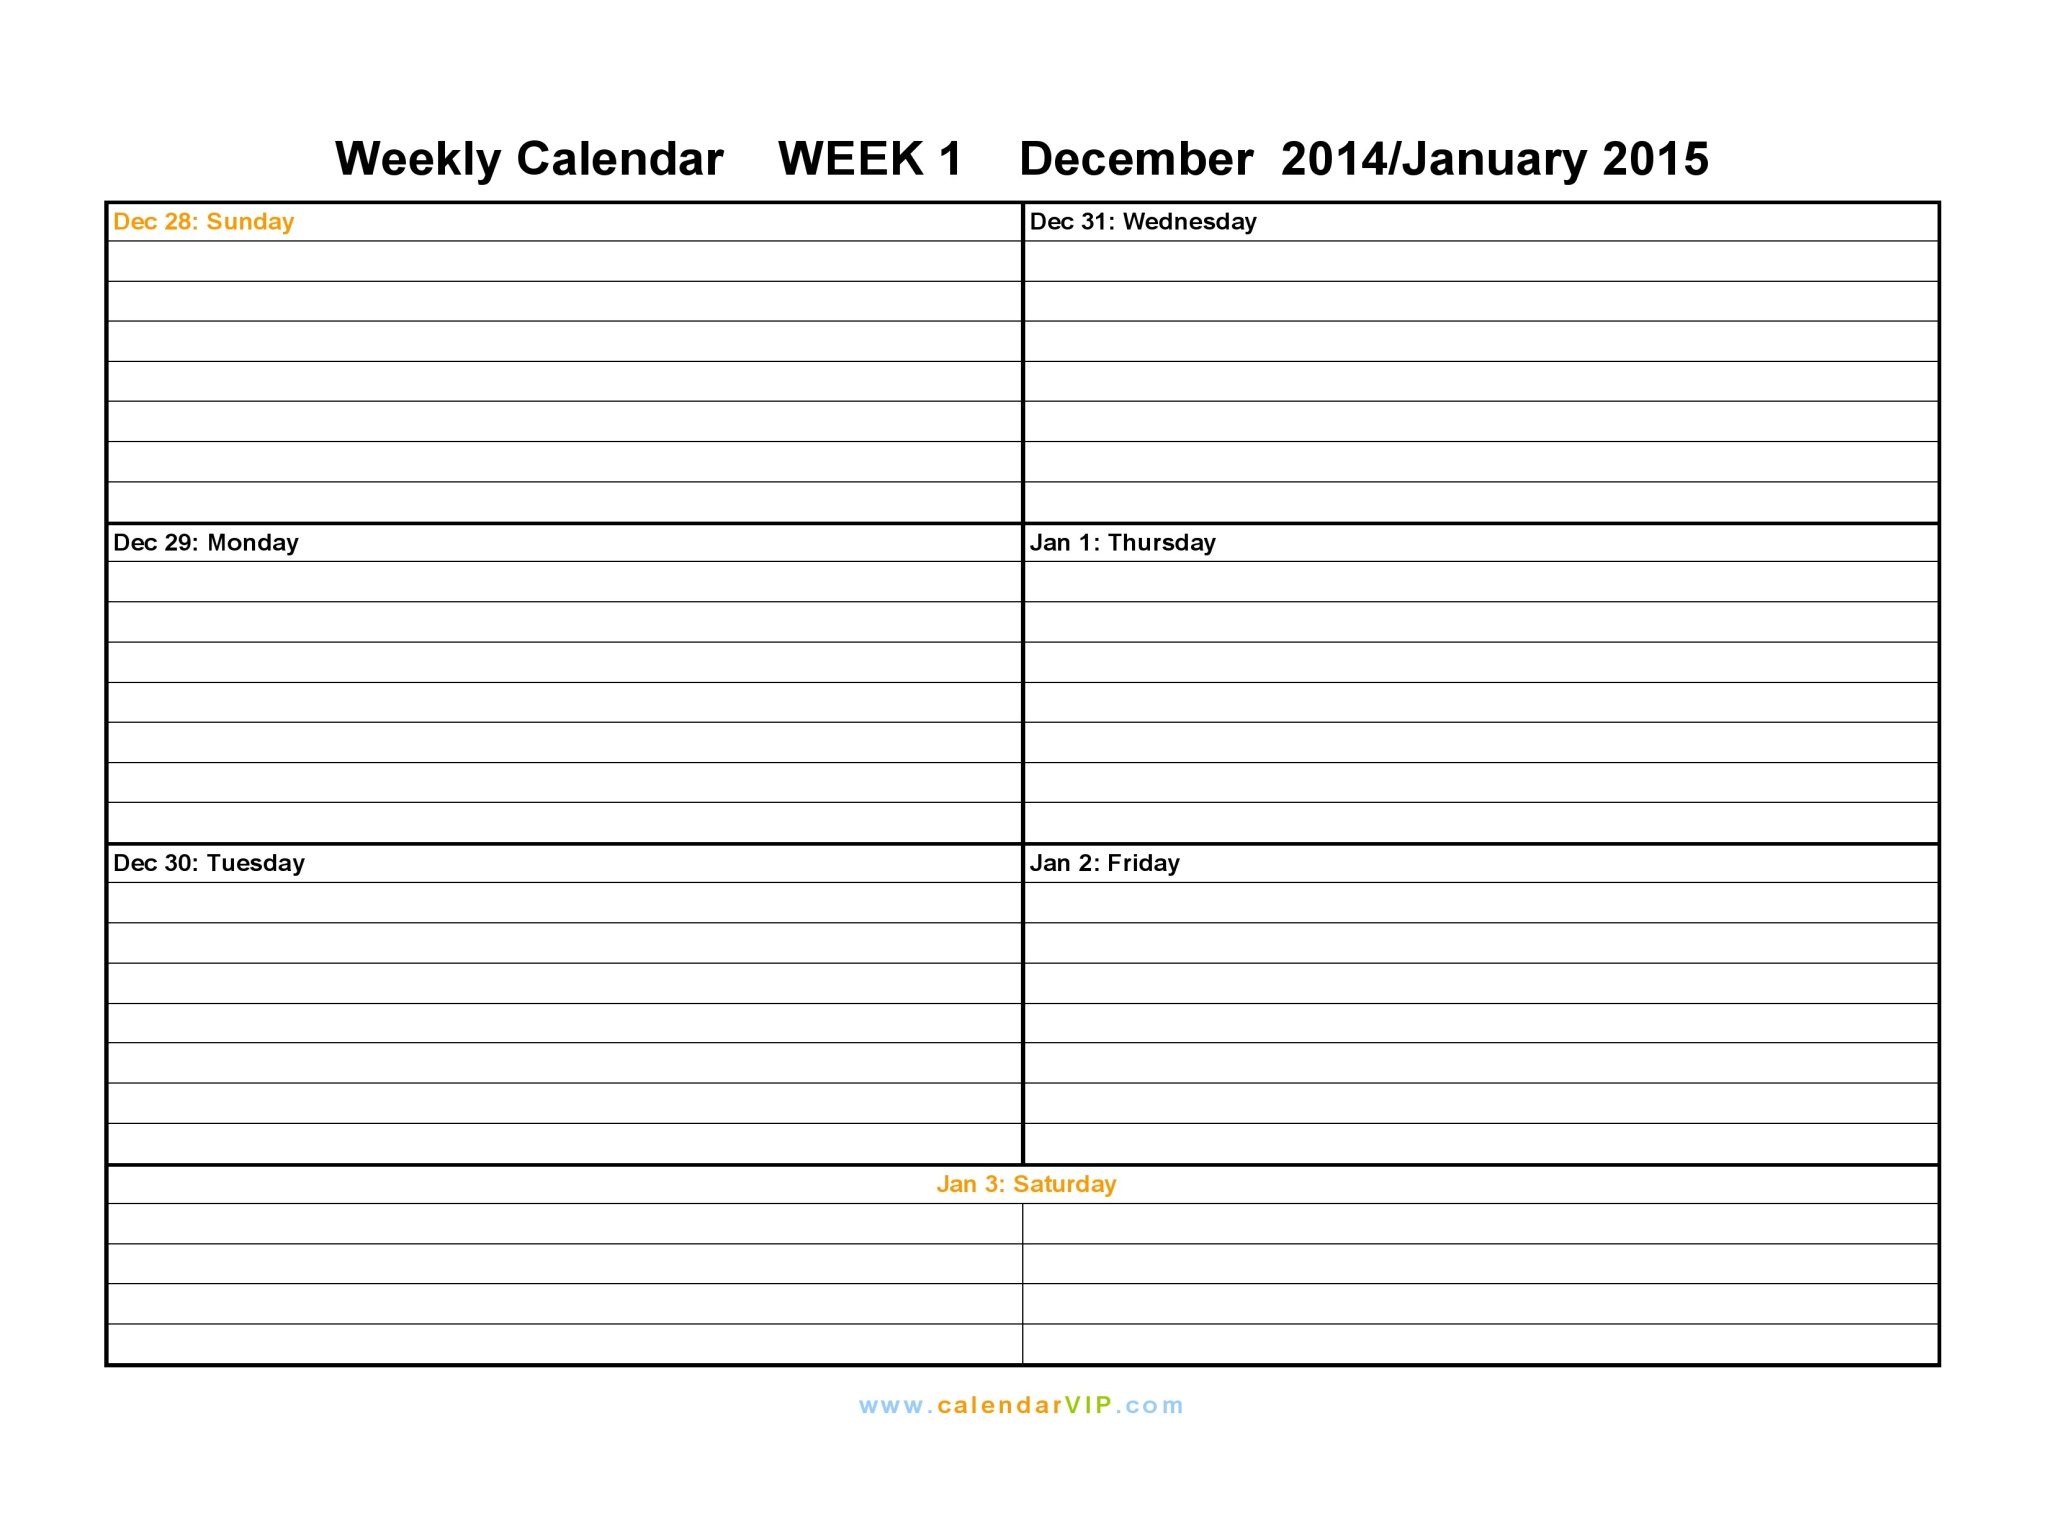 Printable Weekly Schedule Sun Sat | Calendar Template 2016